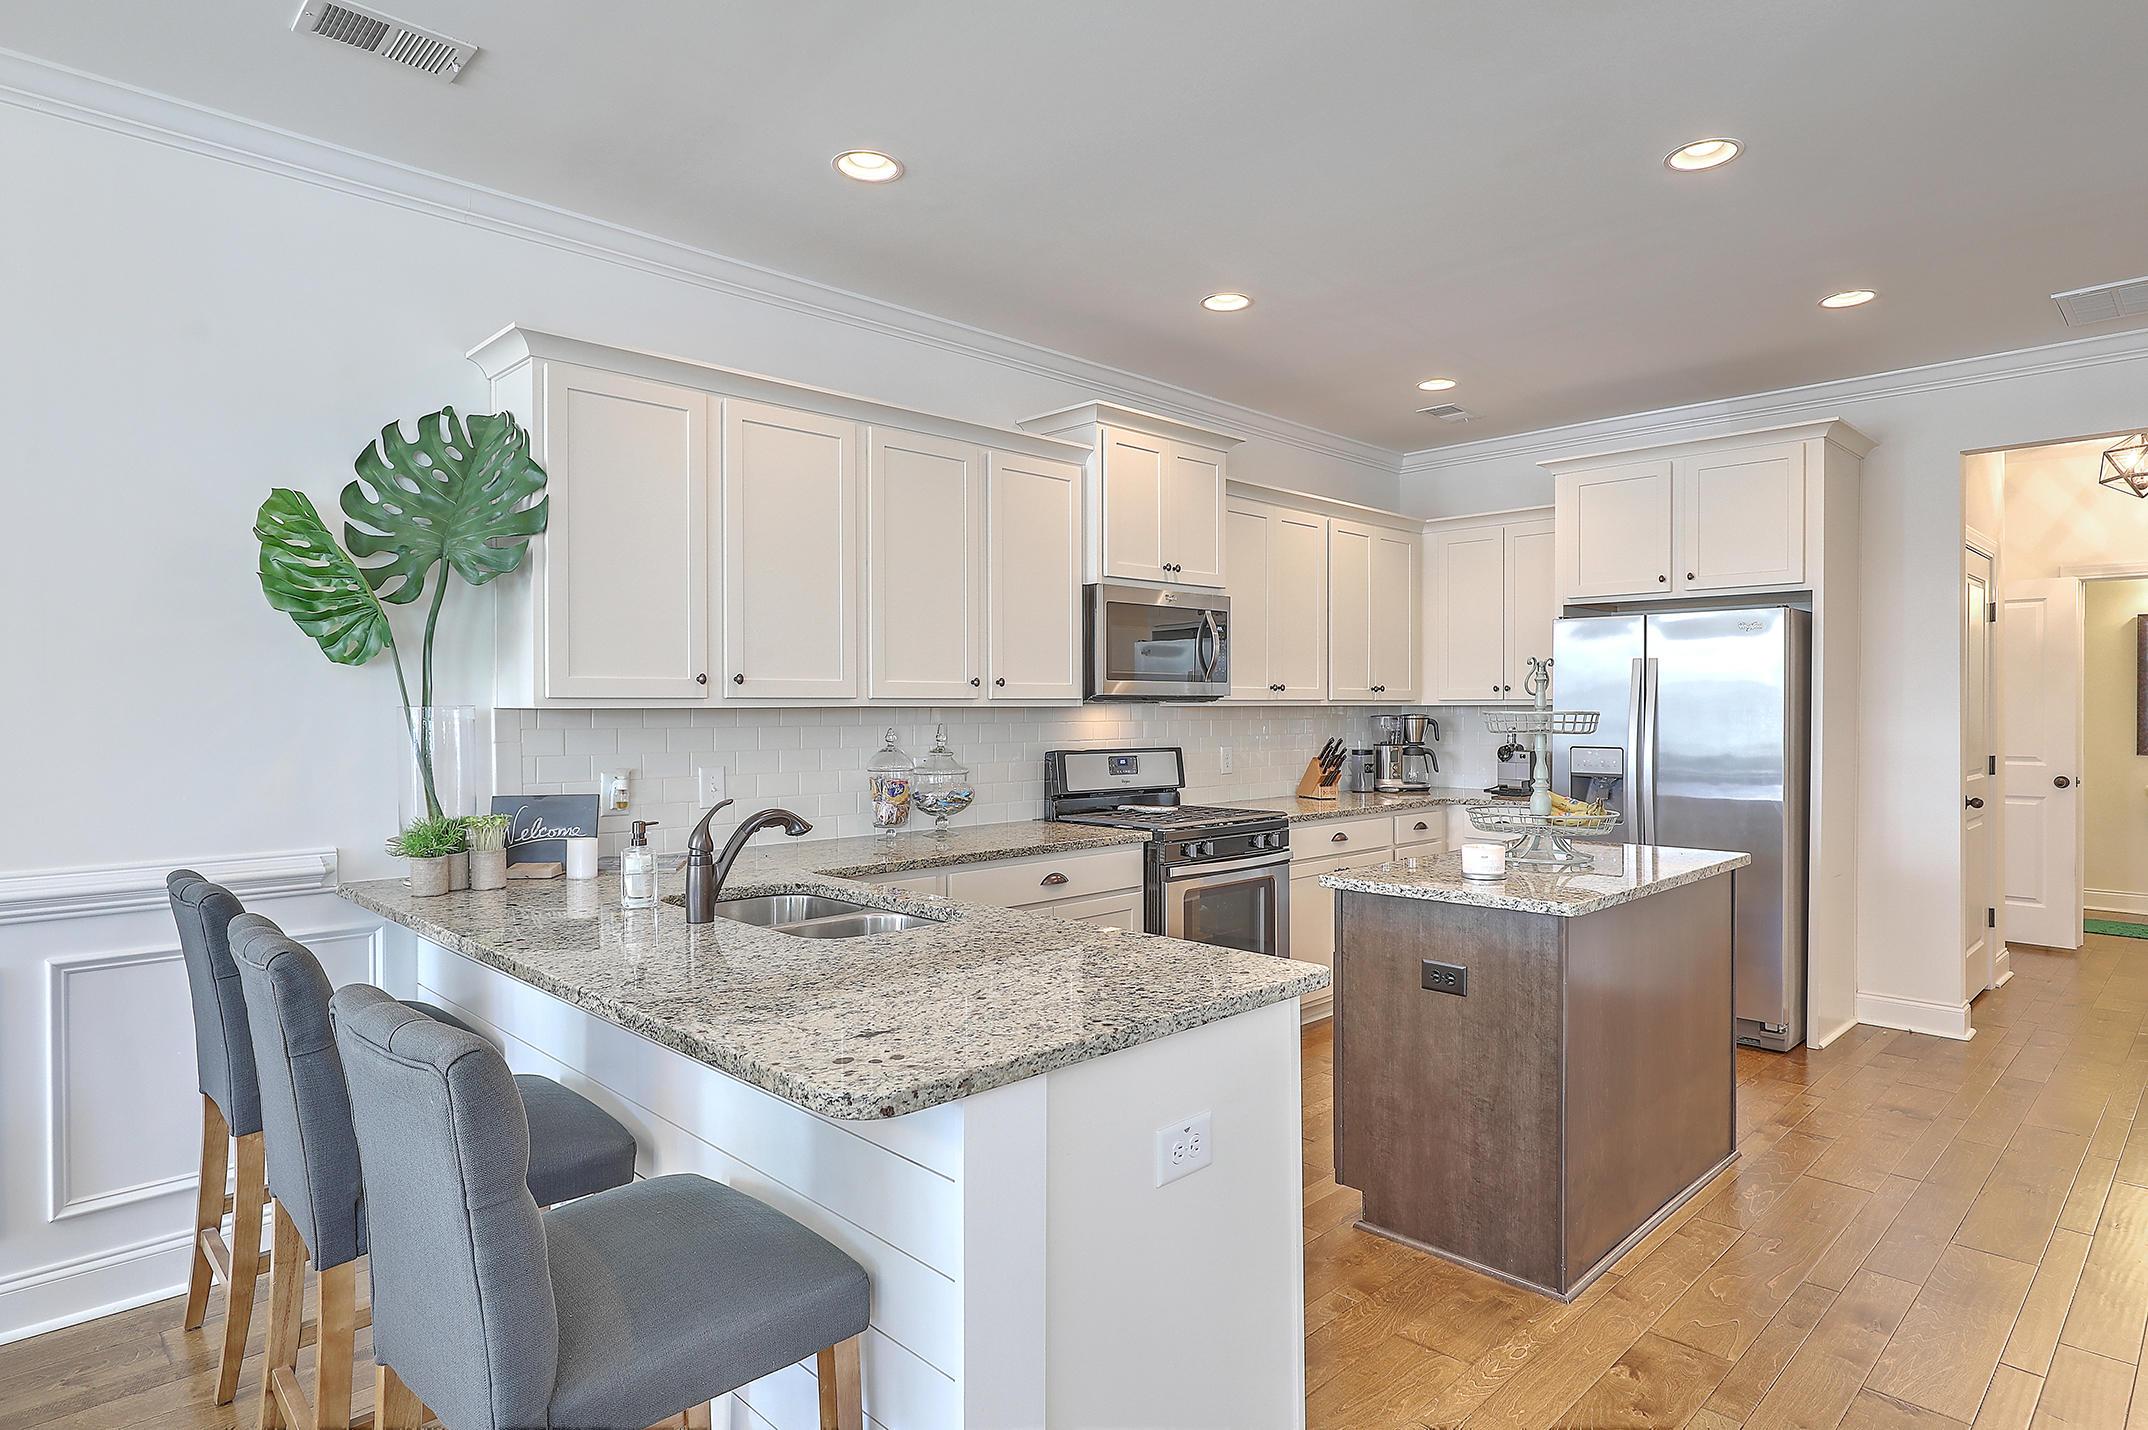 Park West Homes For Sale - 3412 Salterbeck, Mount Pleasant, SC - 9